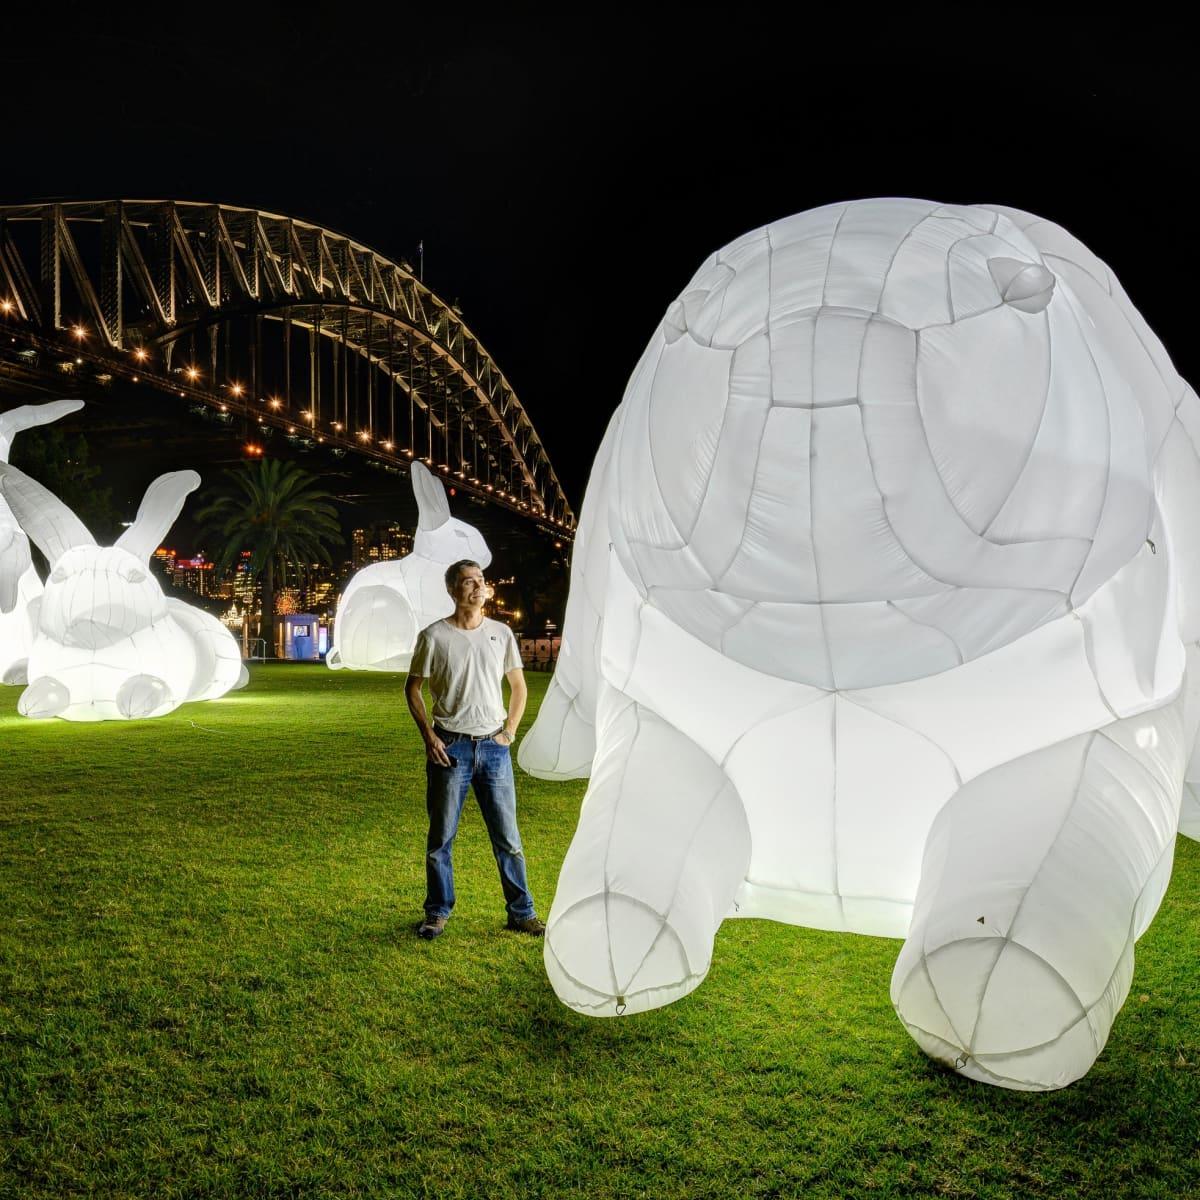 Bunnies Intrude art installation 1600 Smith